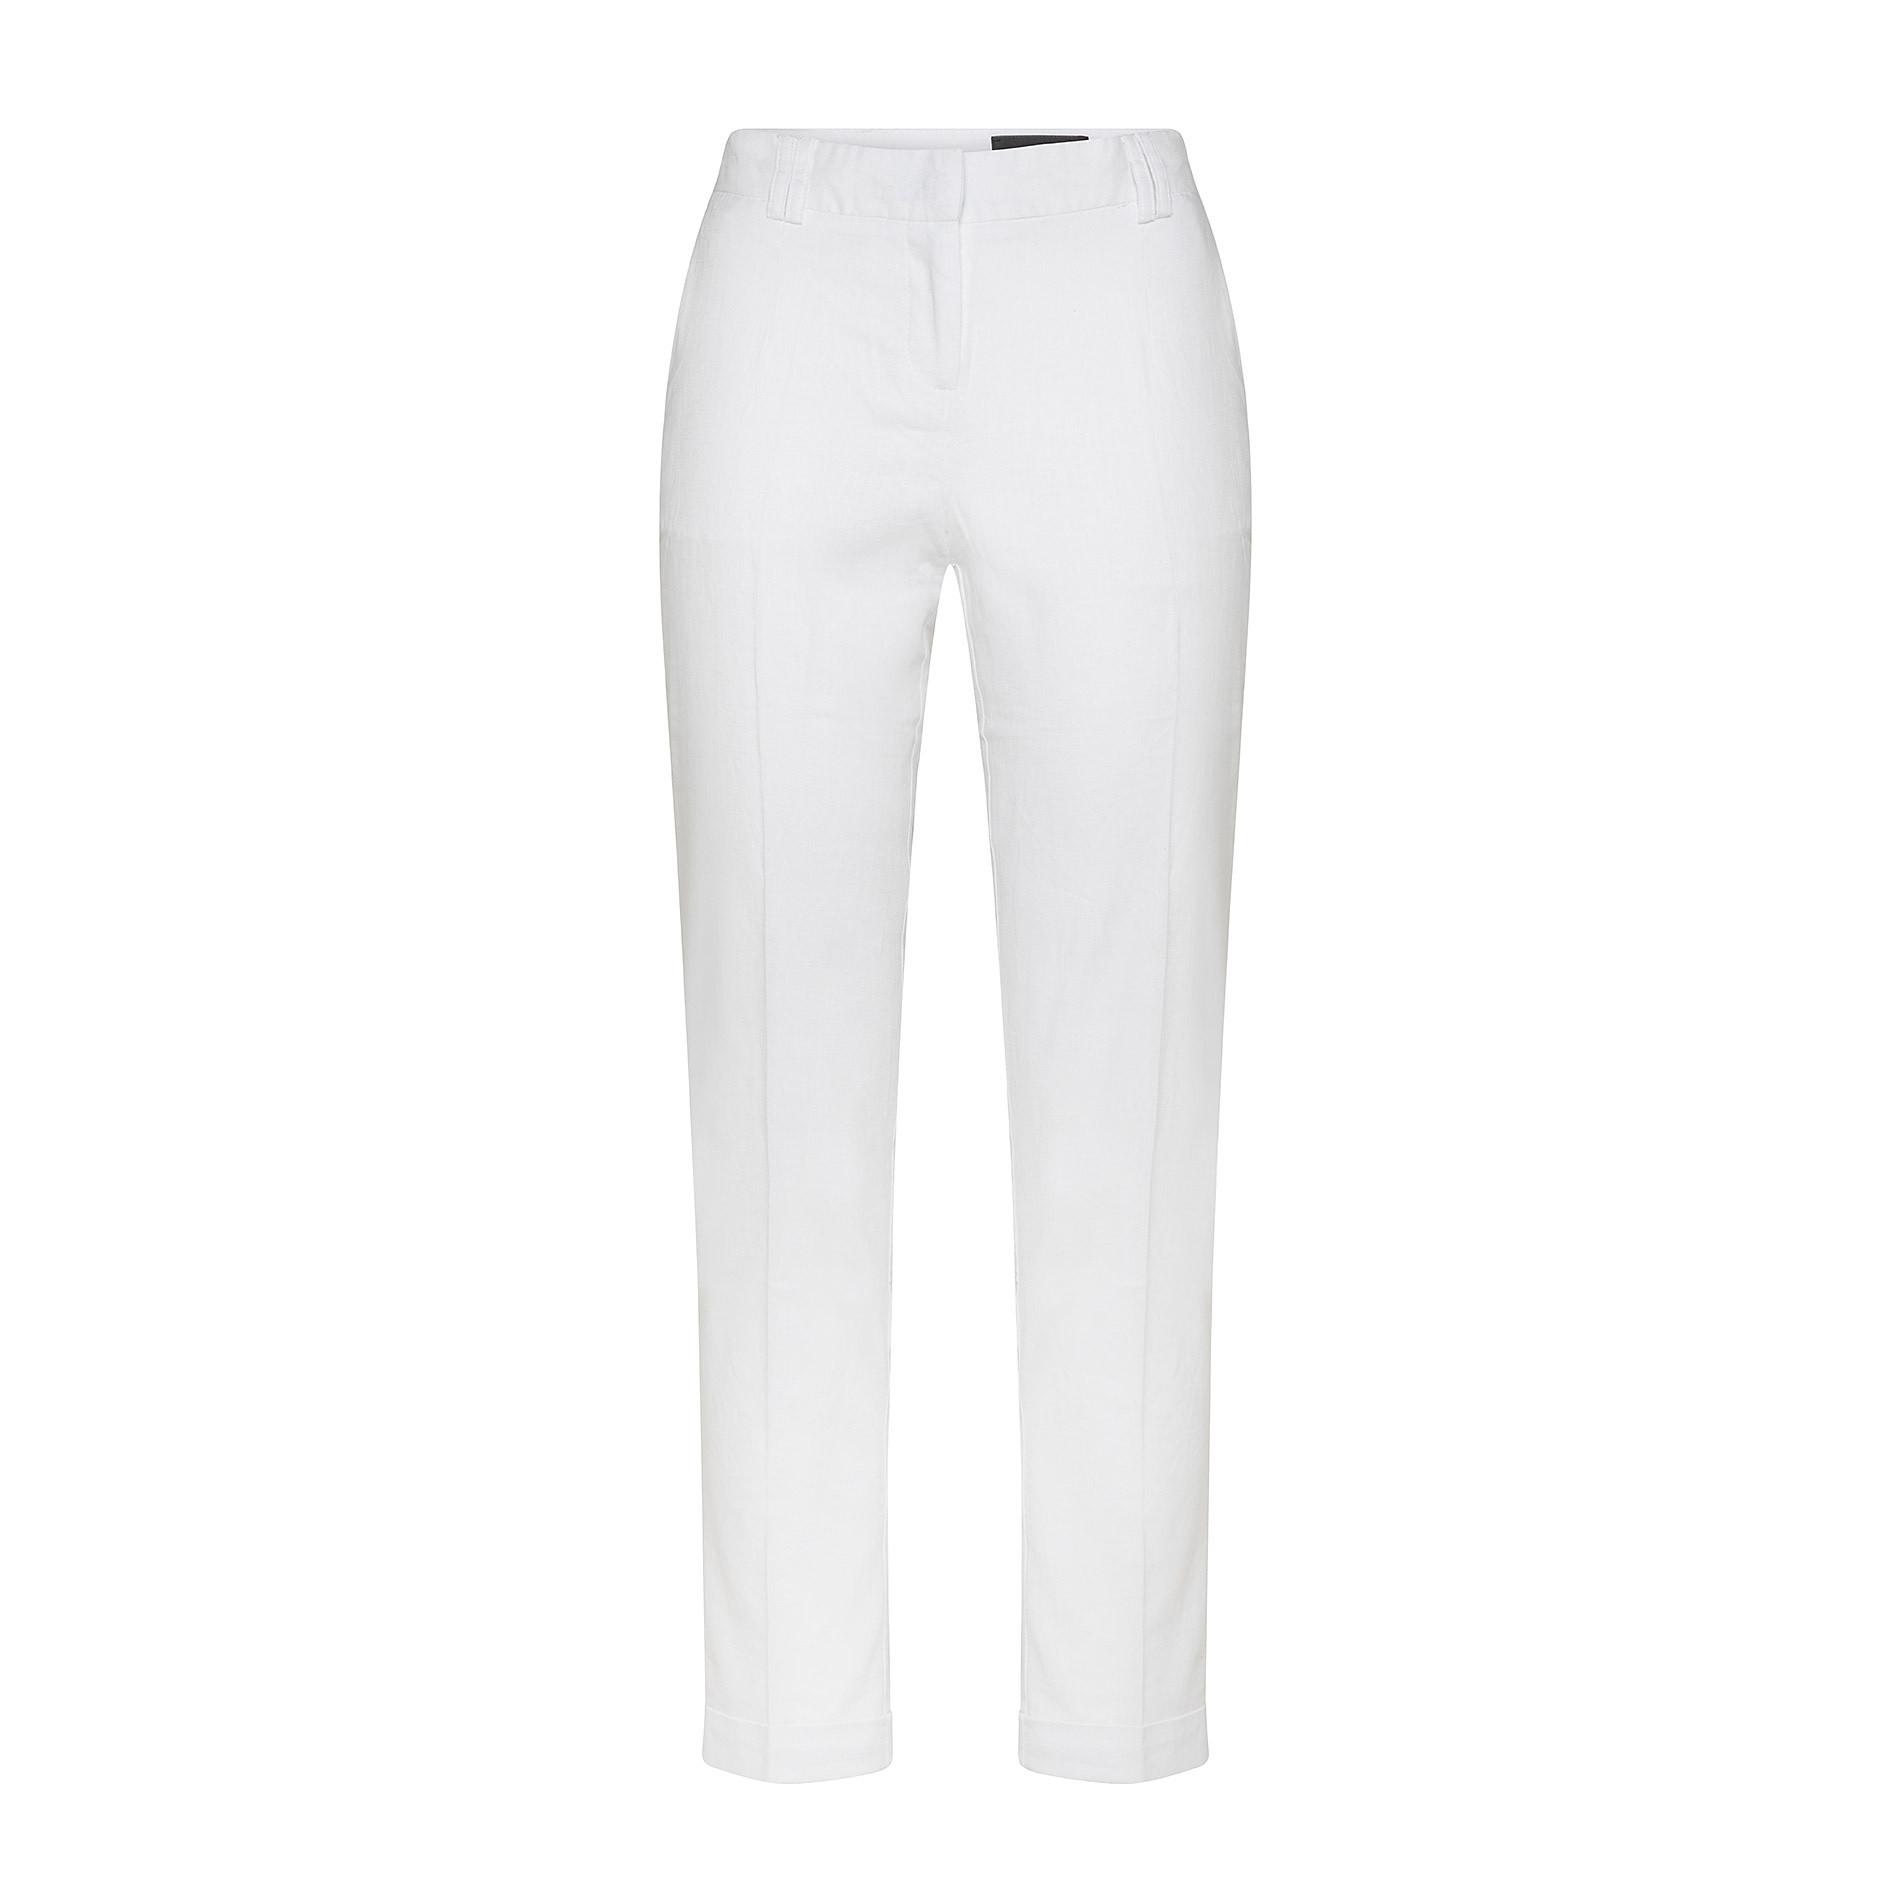 Pantalone classico in misto lino Koan, Bianco, large image number 0